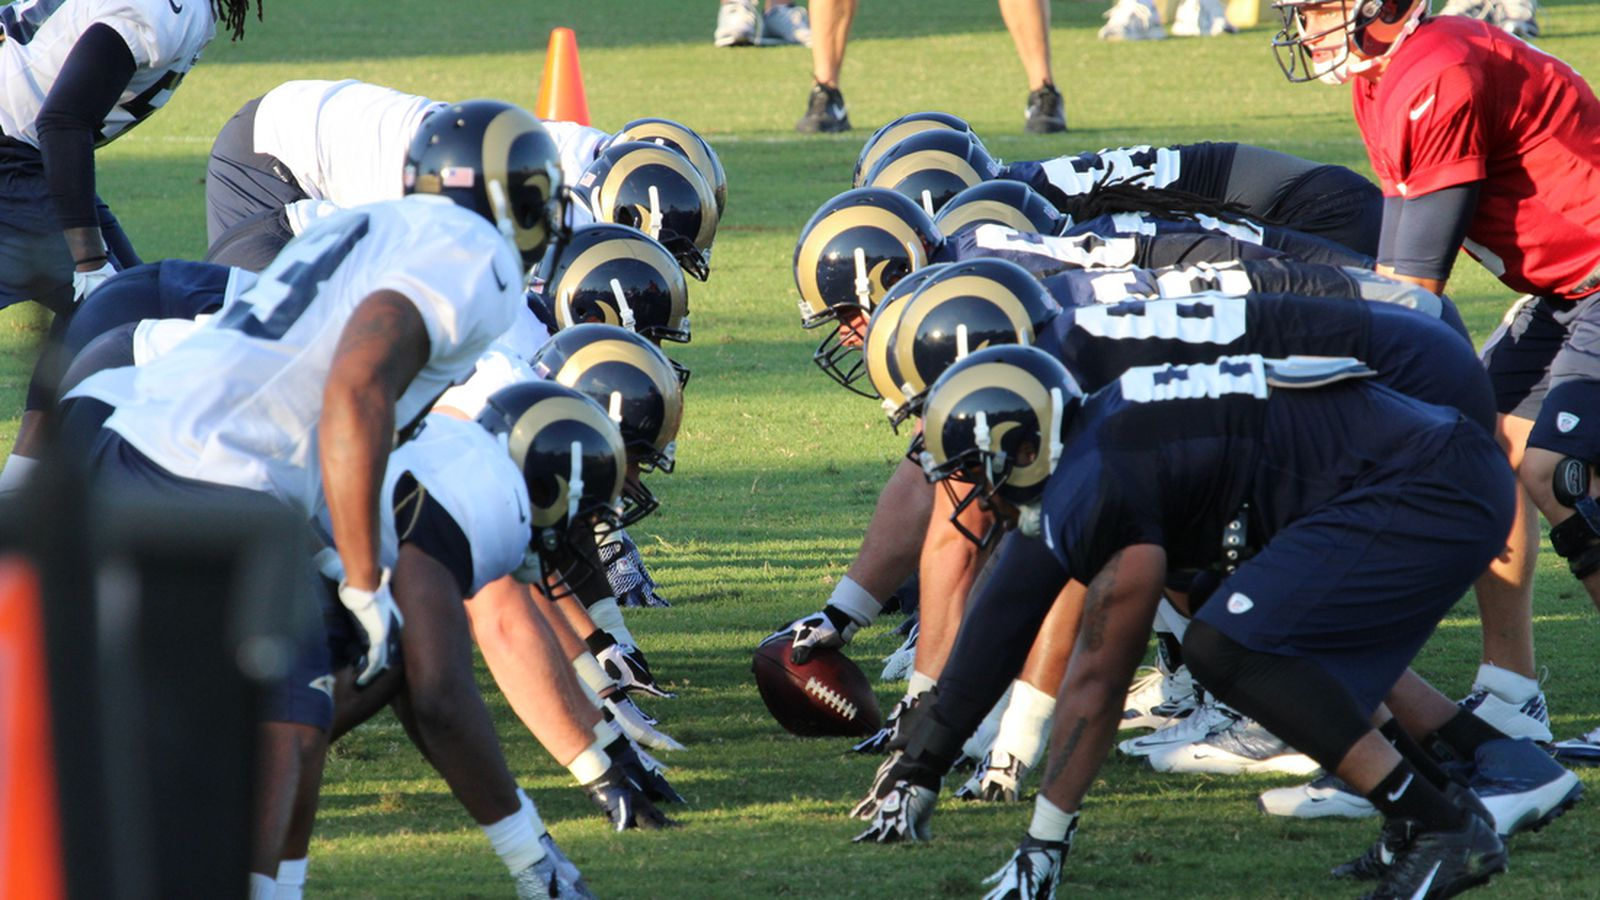 Rams vs. Browns: The preseason begins